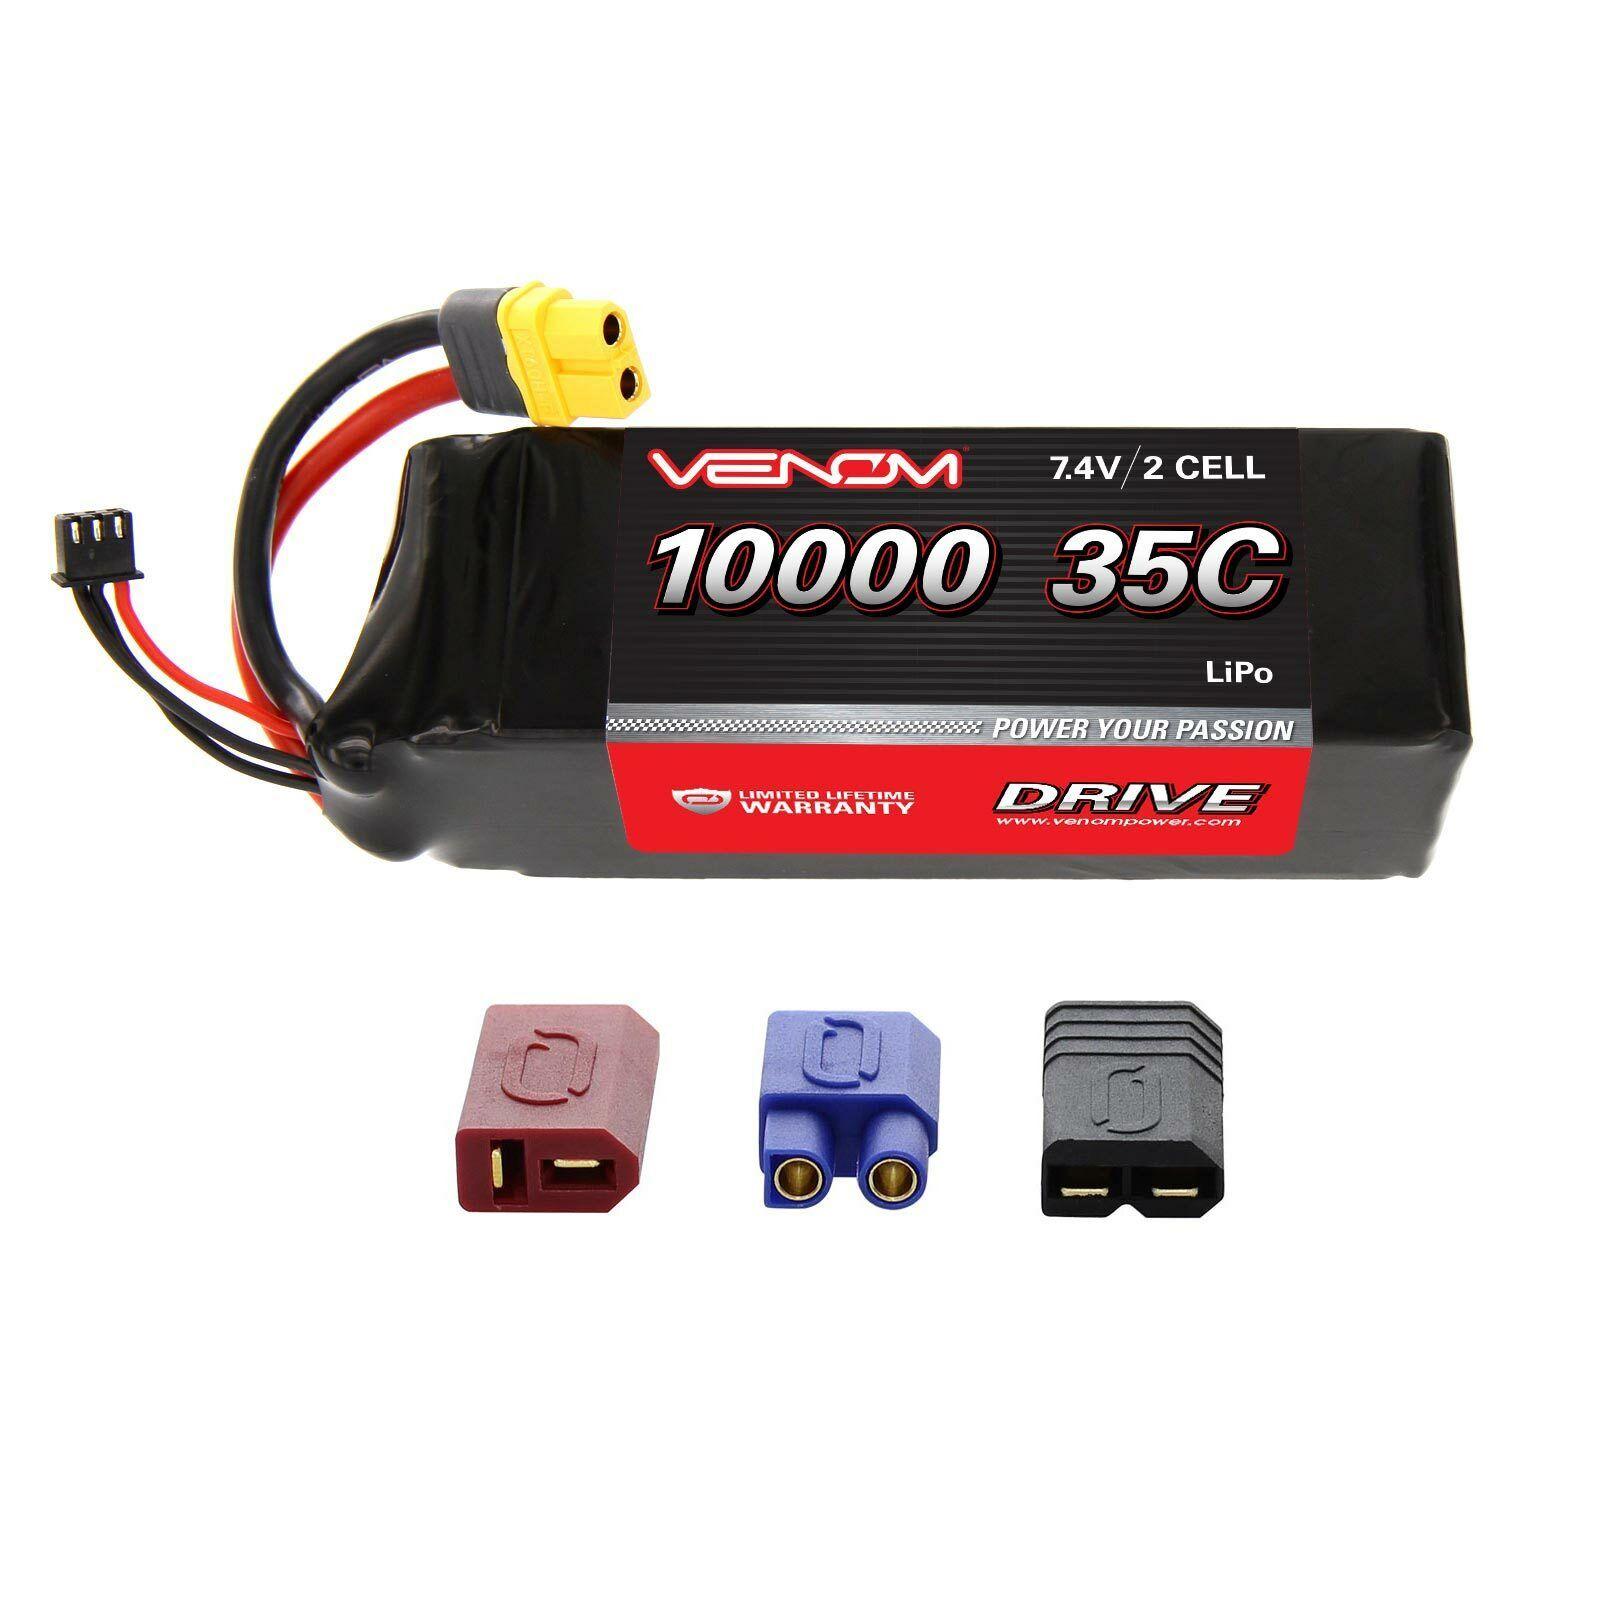 Traxxas diverdeimentony auto 35C 2S 10000mAh 7.4V RC LiPo Battery  by Venom  sport dello shopping online